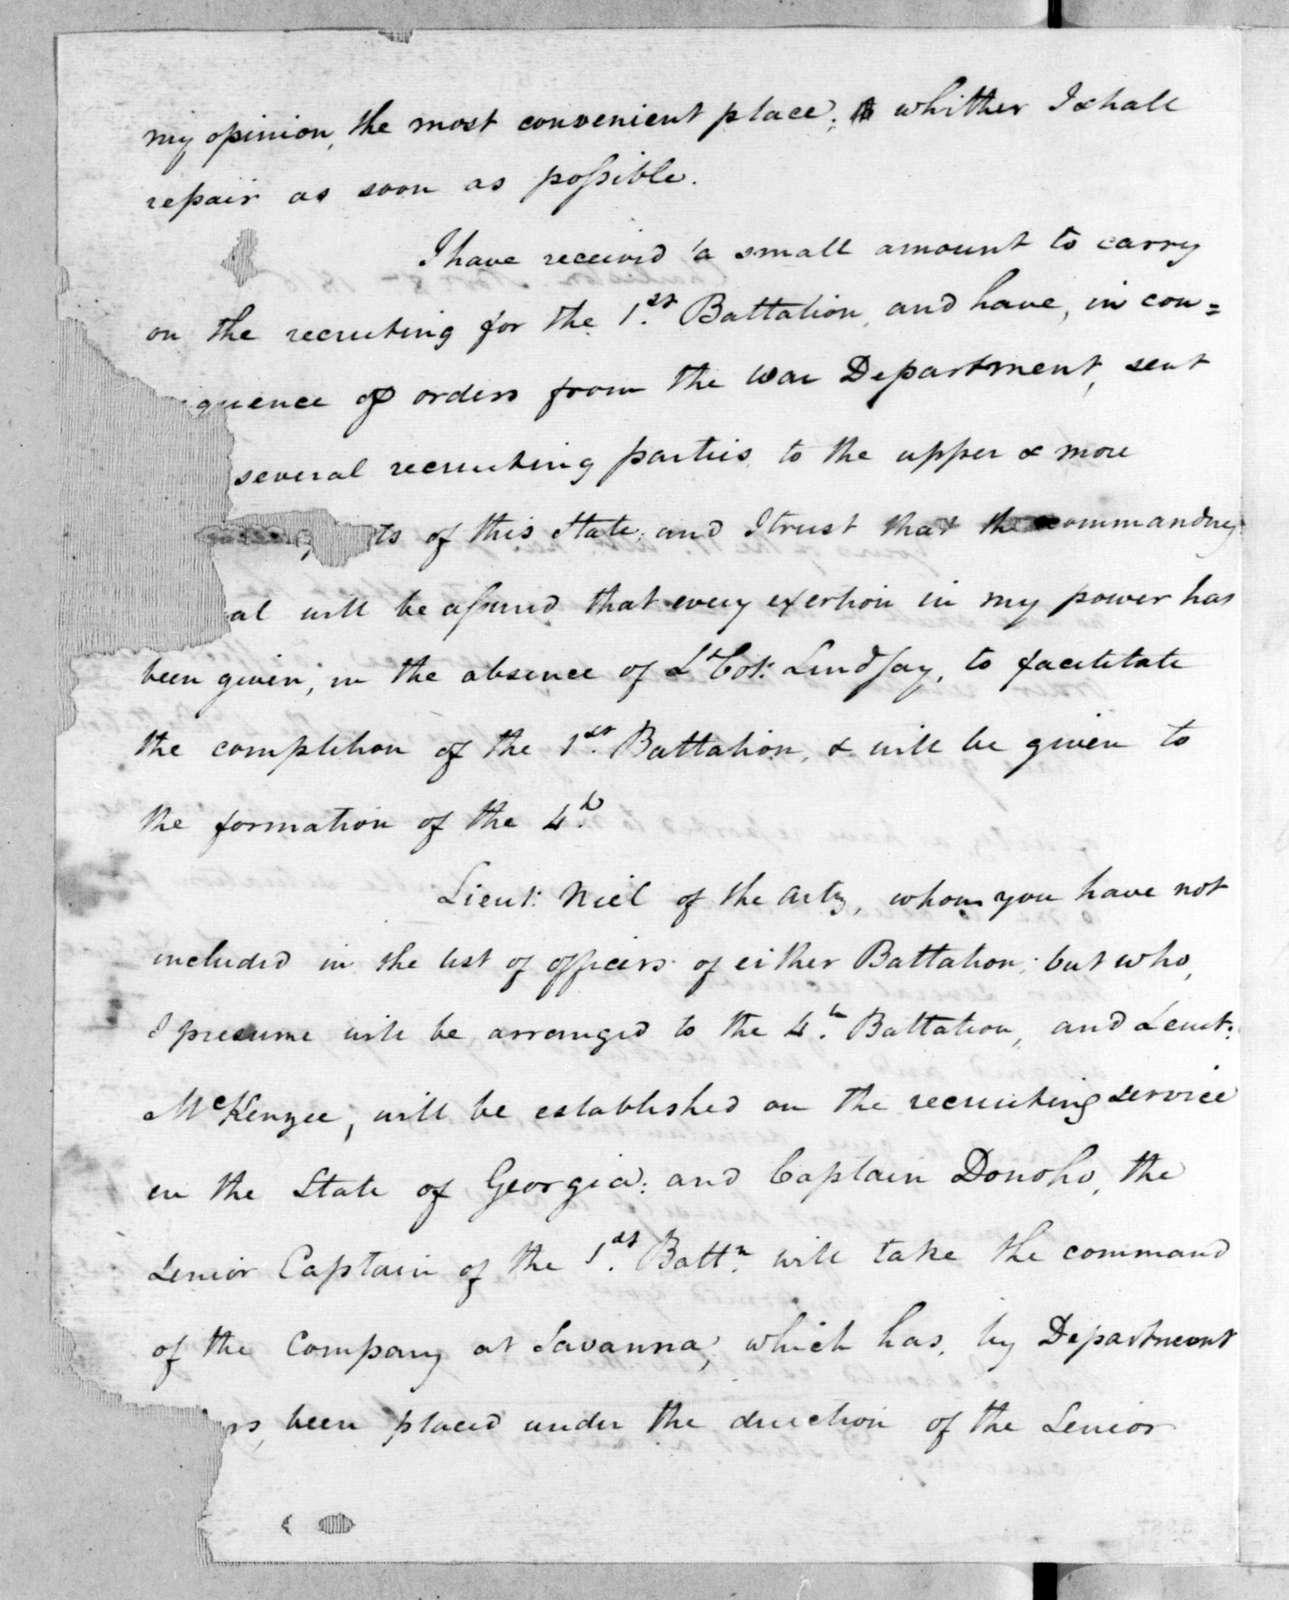 James Bankhead to Robert Butler, November 8, 1816